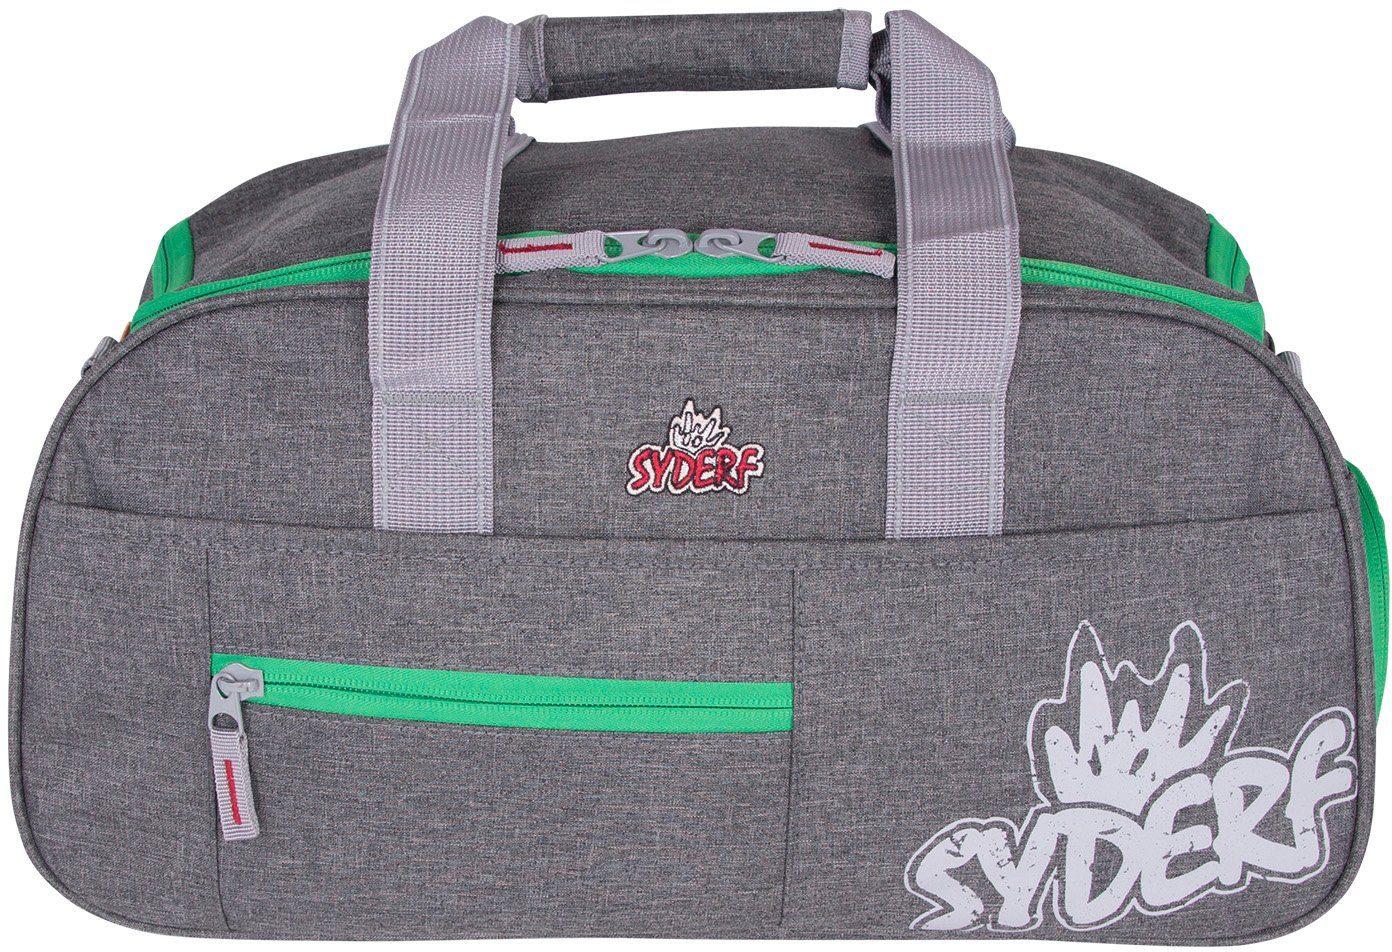 Syderf Sporttasche, »Five Stone«